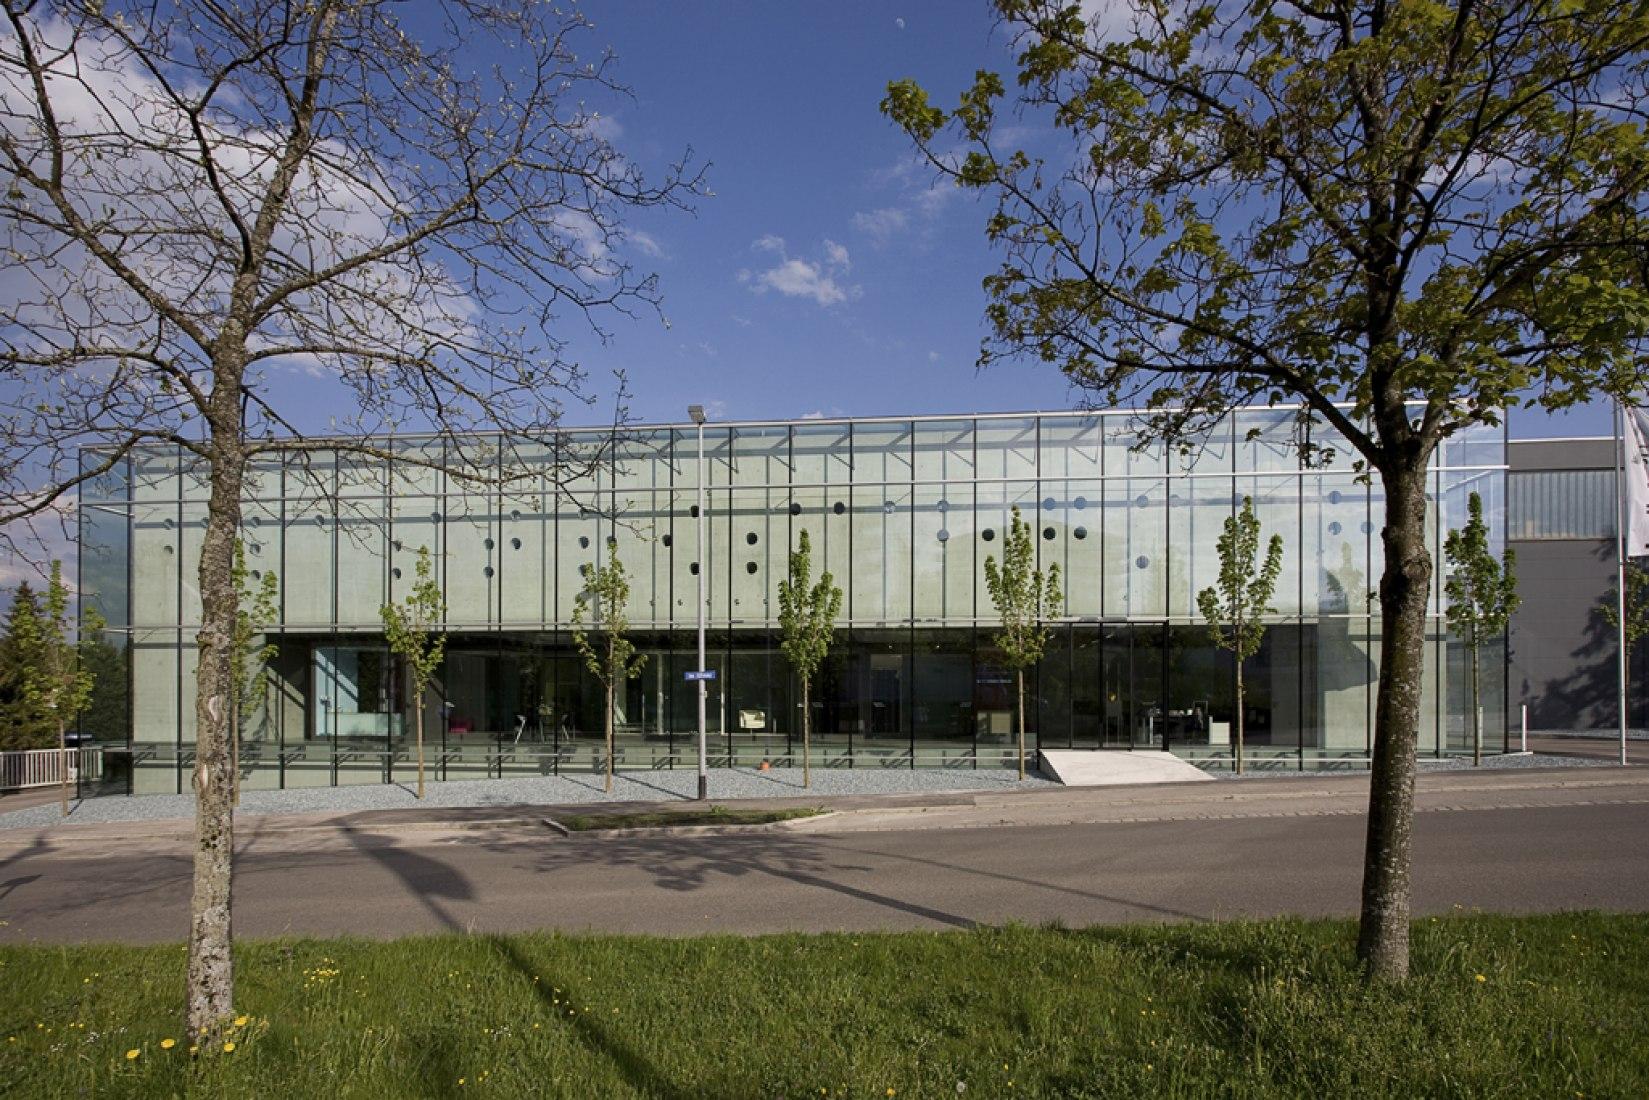 Centro de Conocimientos Glastroesch por Becker Architekten. Fotografía © Nikolaus Grünwald.